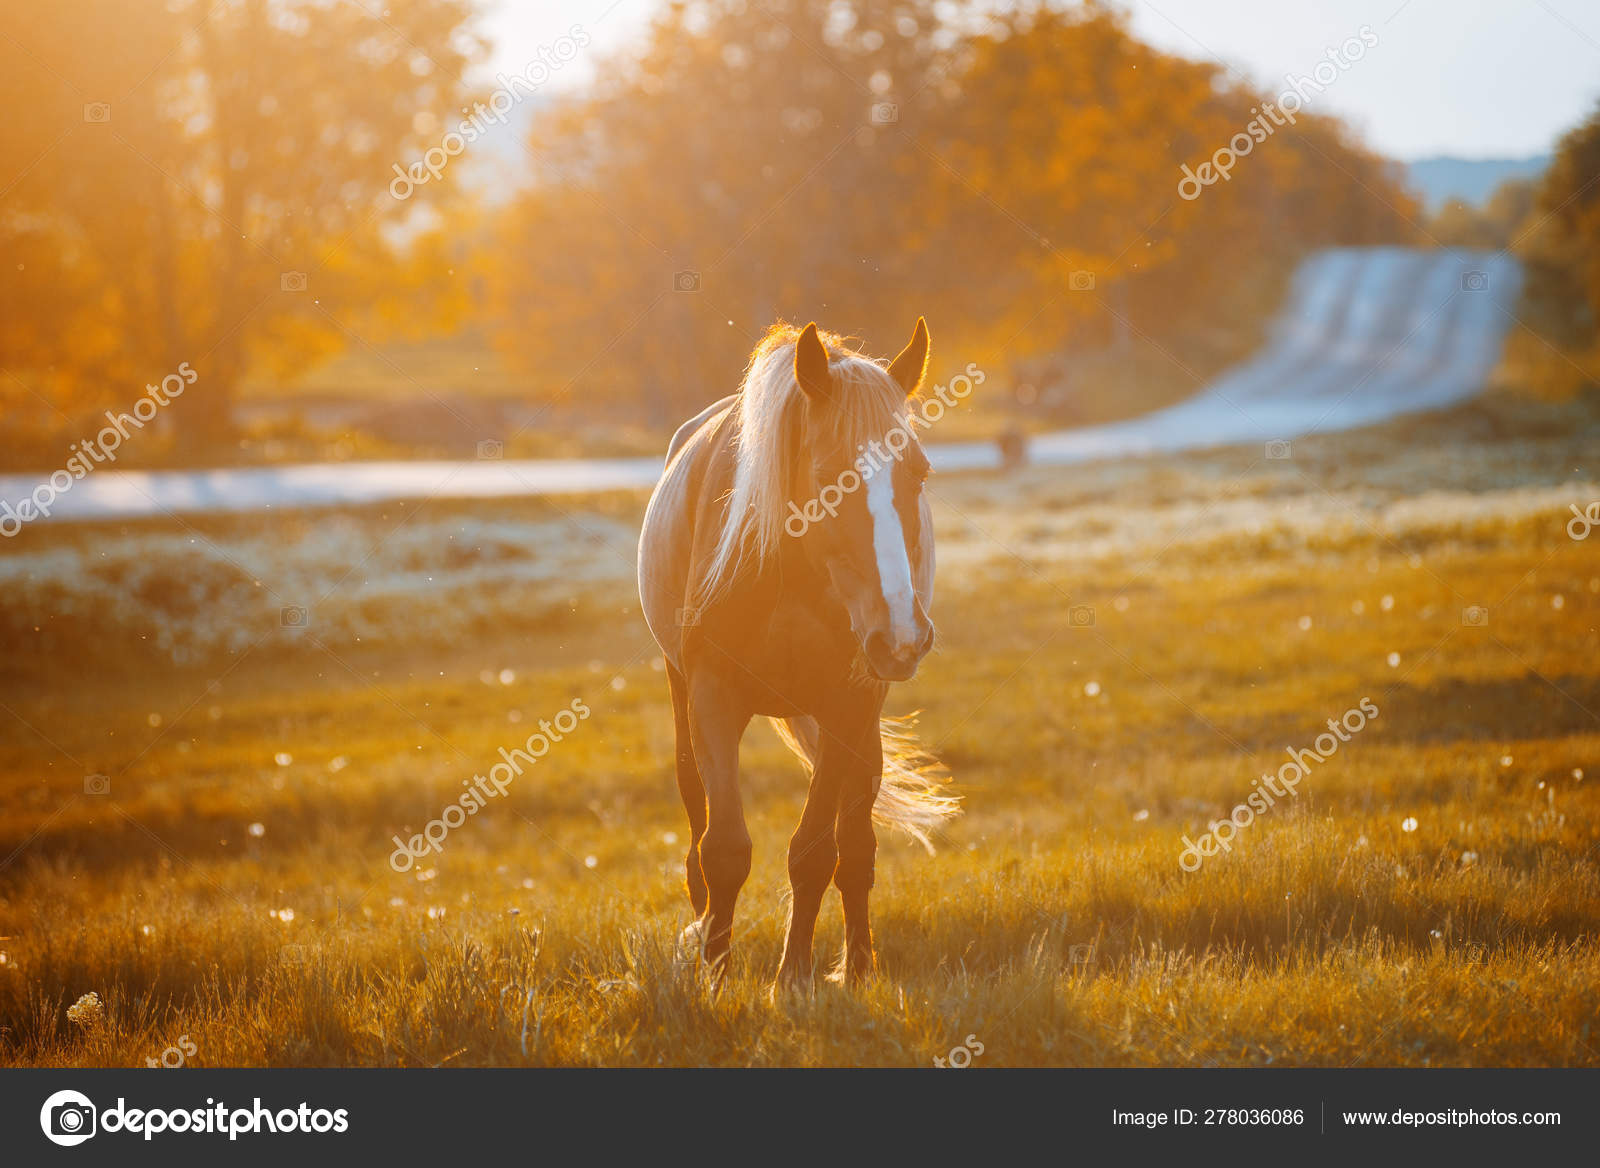 Photo Of Alone Beautiful Horse Walking Along The Road At Sunset Stock Photo C Cristalov 278036086